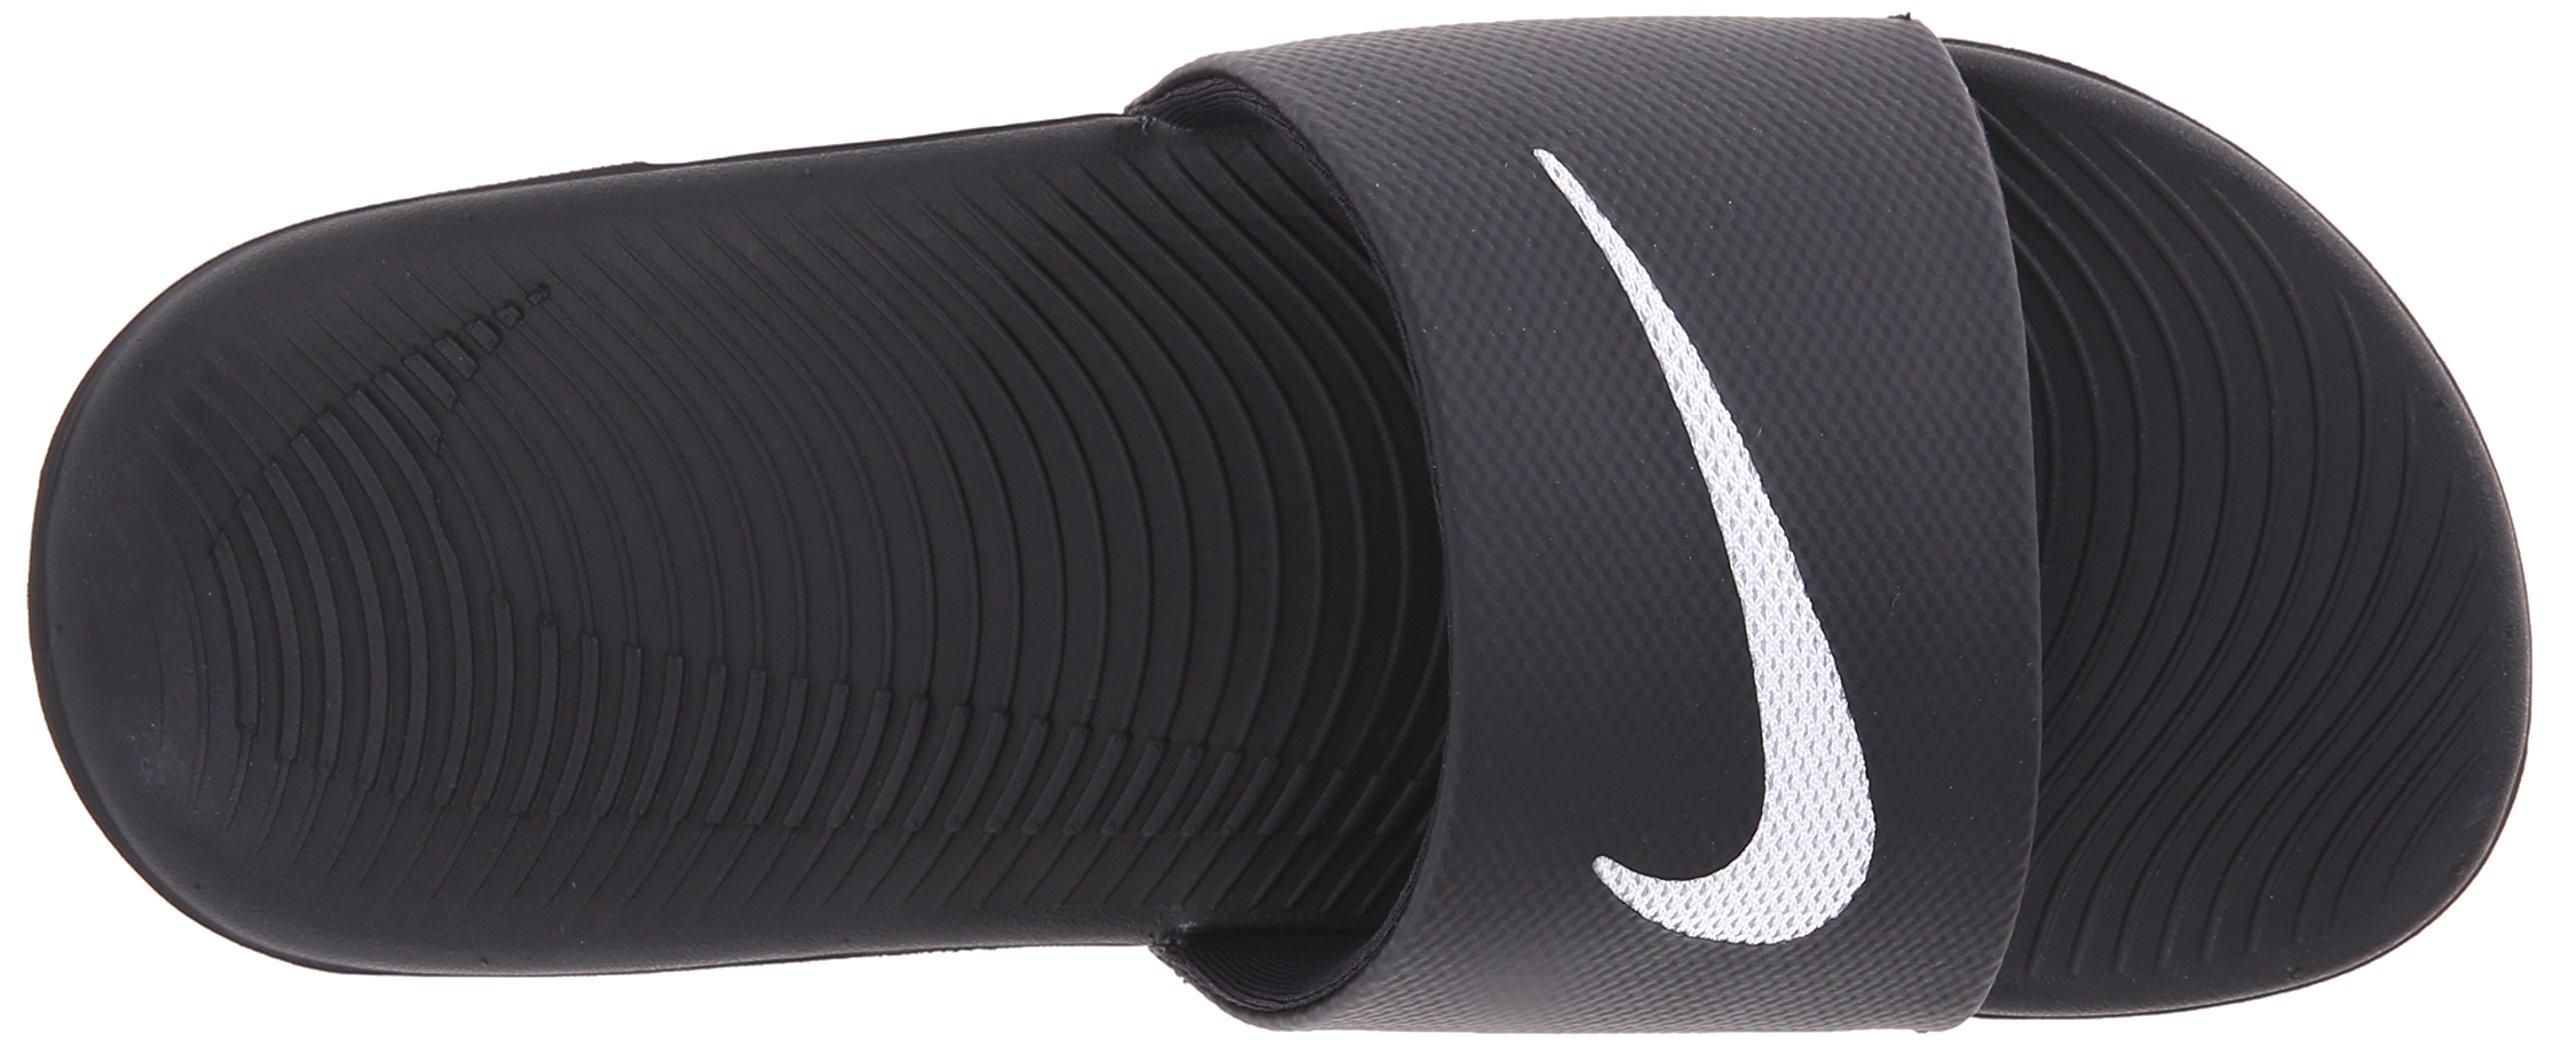 NIKE Kids' Kawa Slide Sandal, Black/White, 4 M US Big Kid by Nike (Image #8)